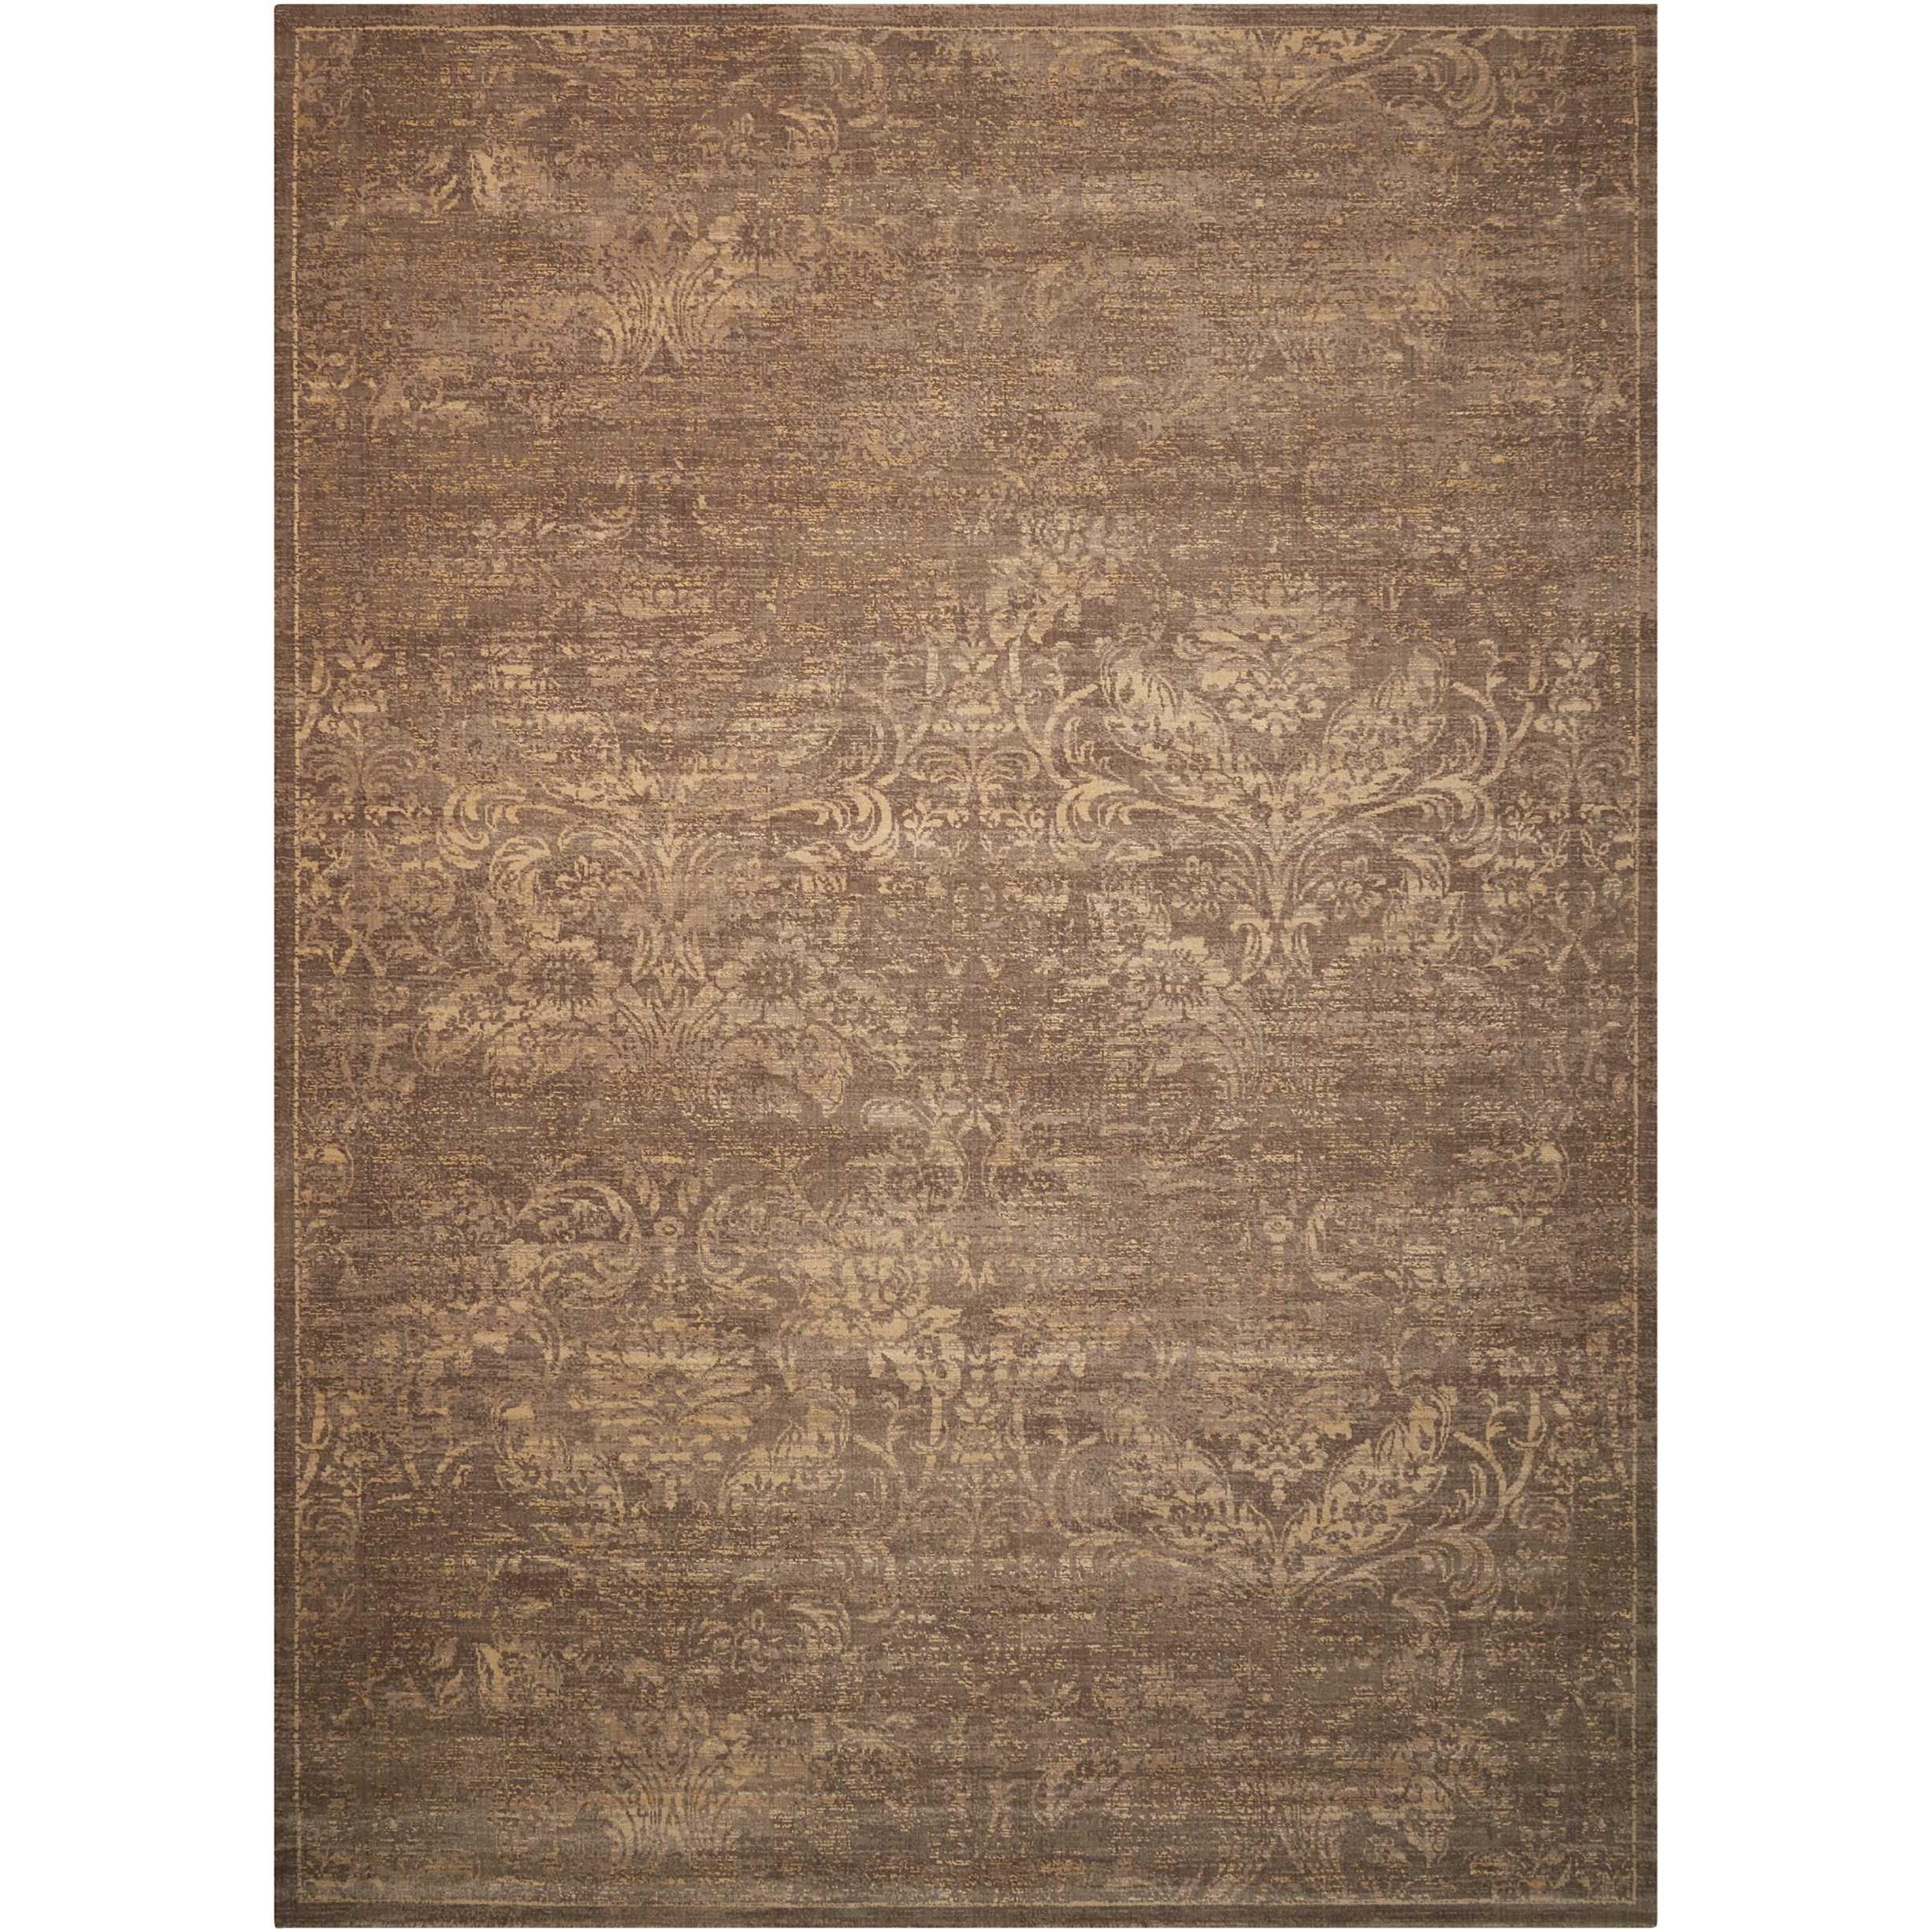 Silken Allure 12' x 15' Mushroom Rectangle Rug by Nourison at Sprintz Furniture